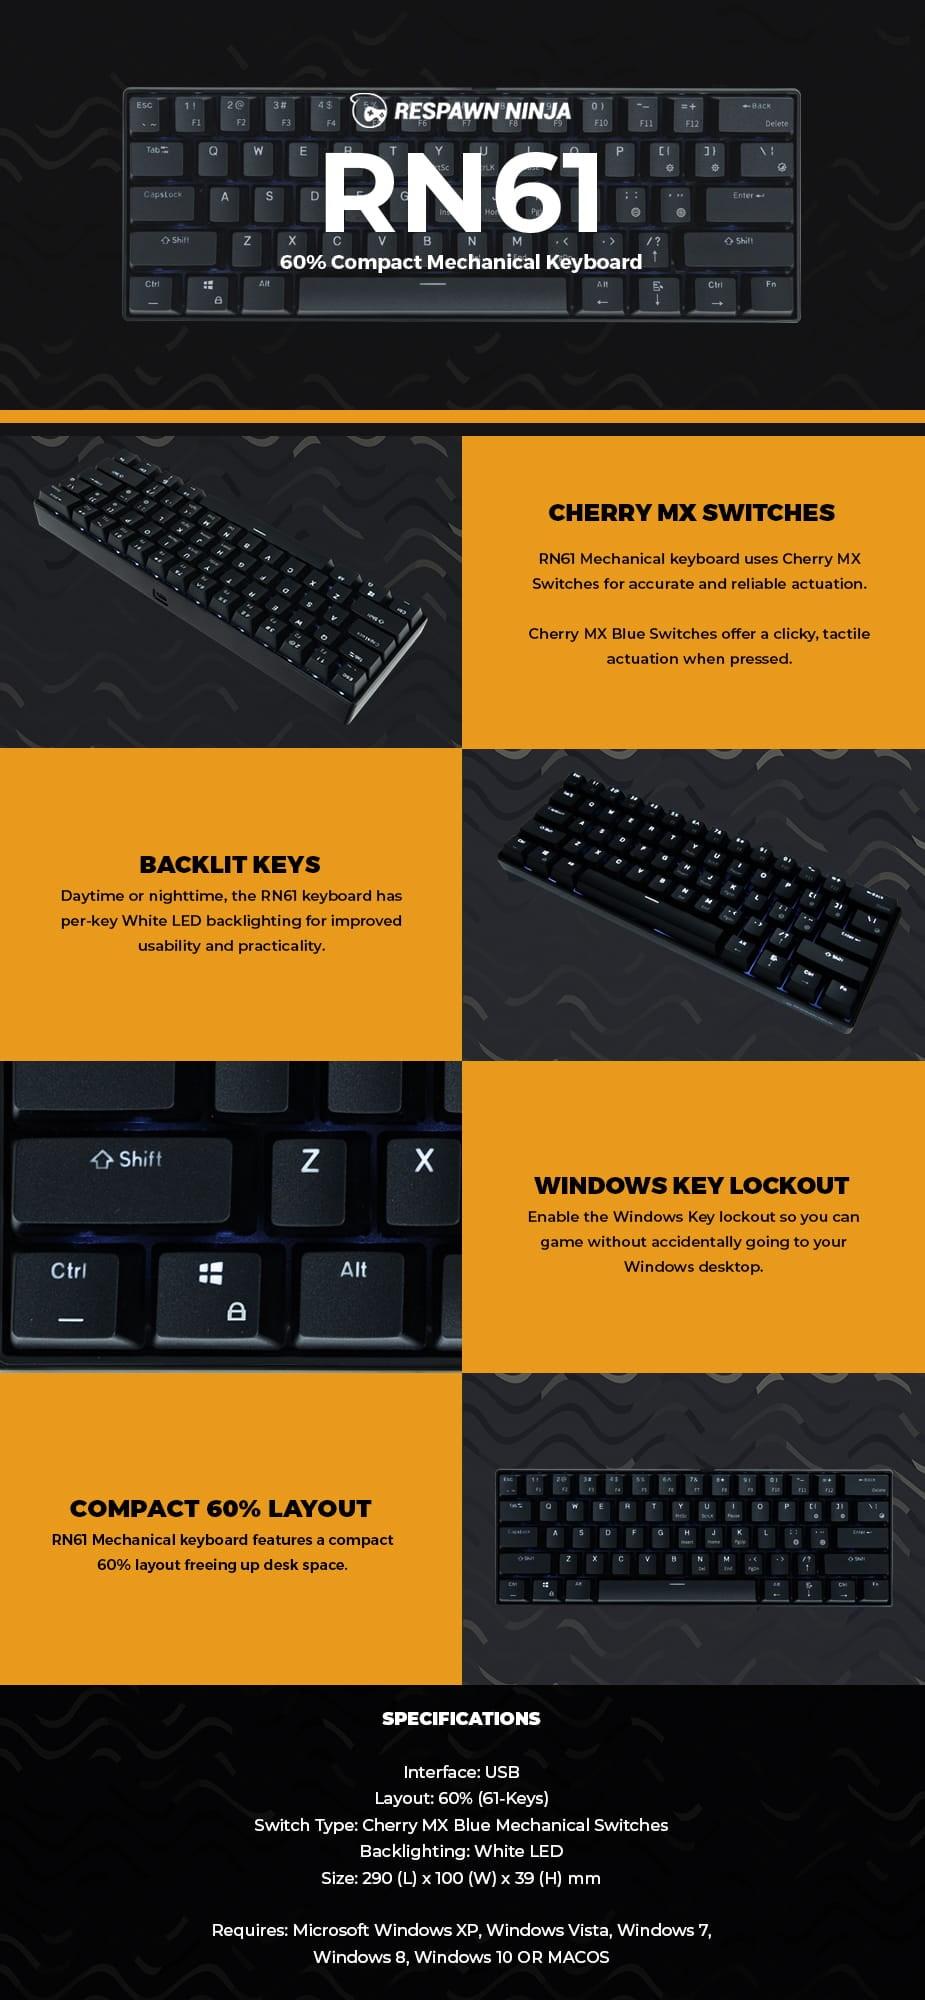 Respawn Ninja RN61 Compact Mechanical Gaming White LED Keyboard - Cherry MX Blue - desktop overview 1